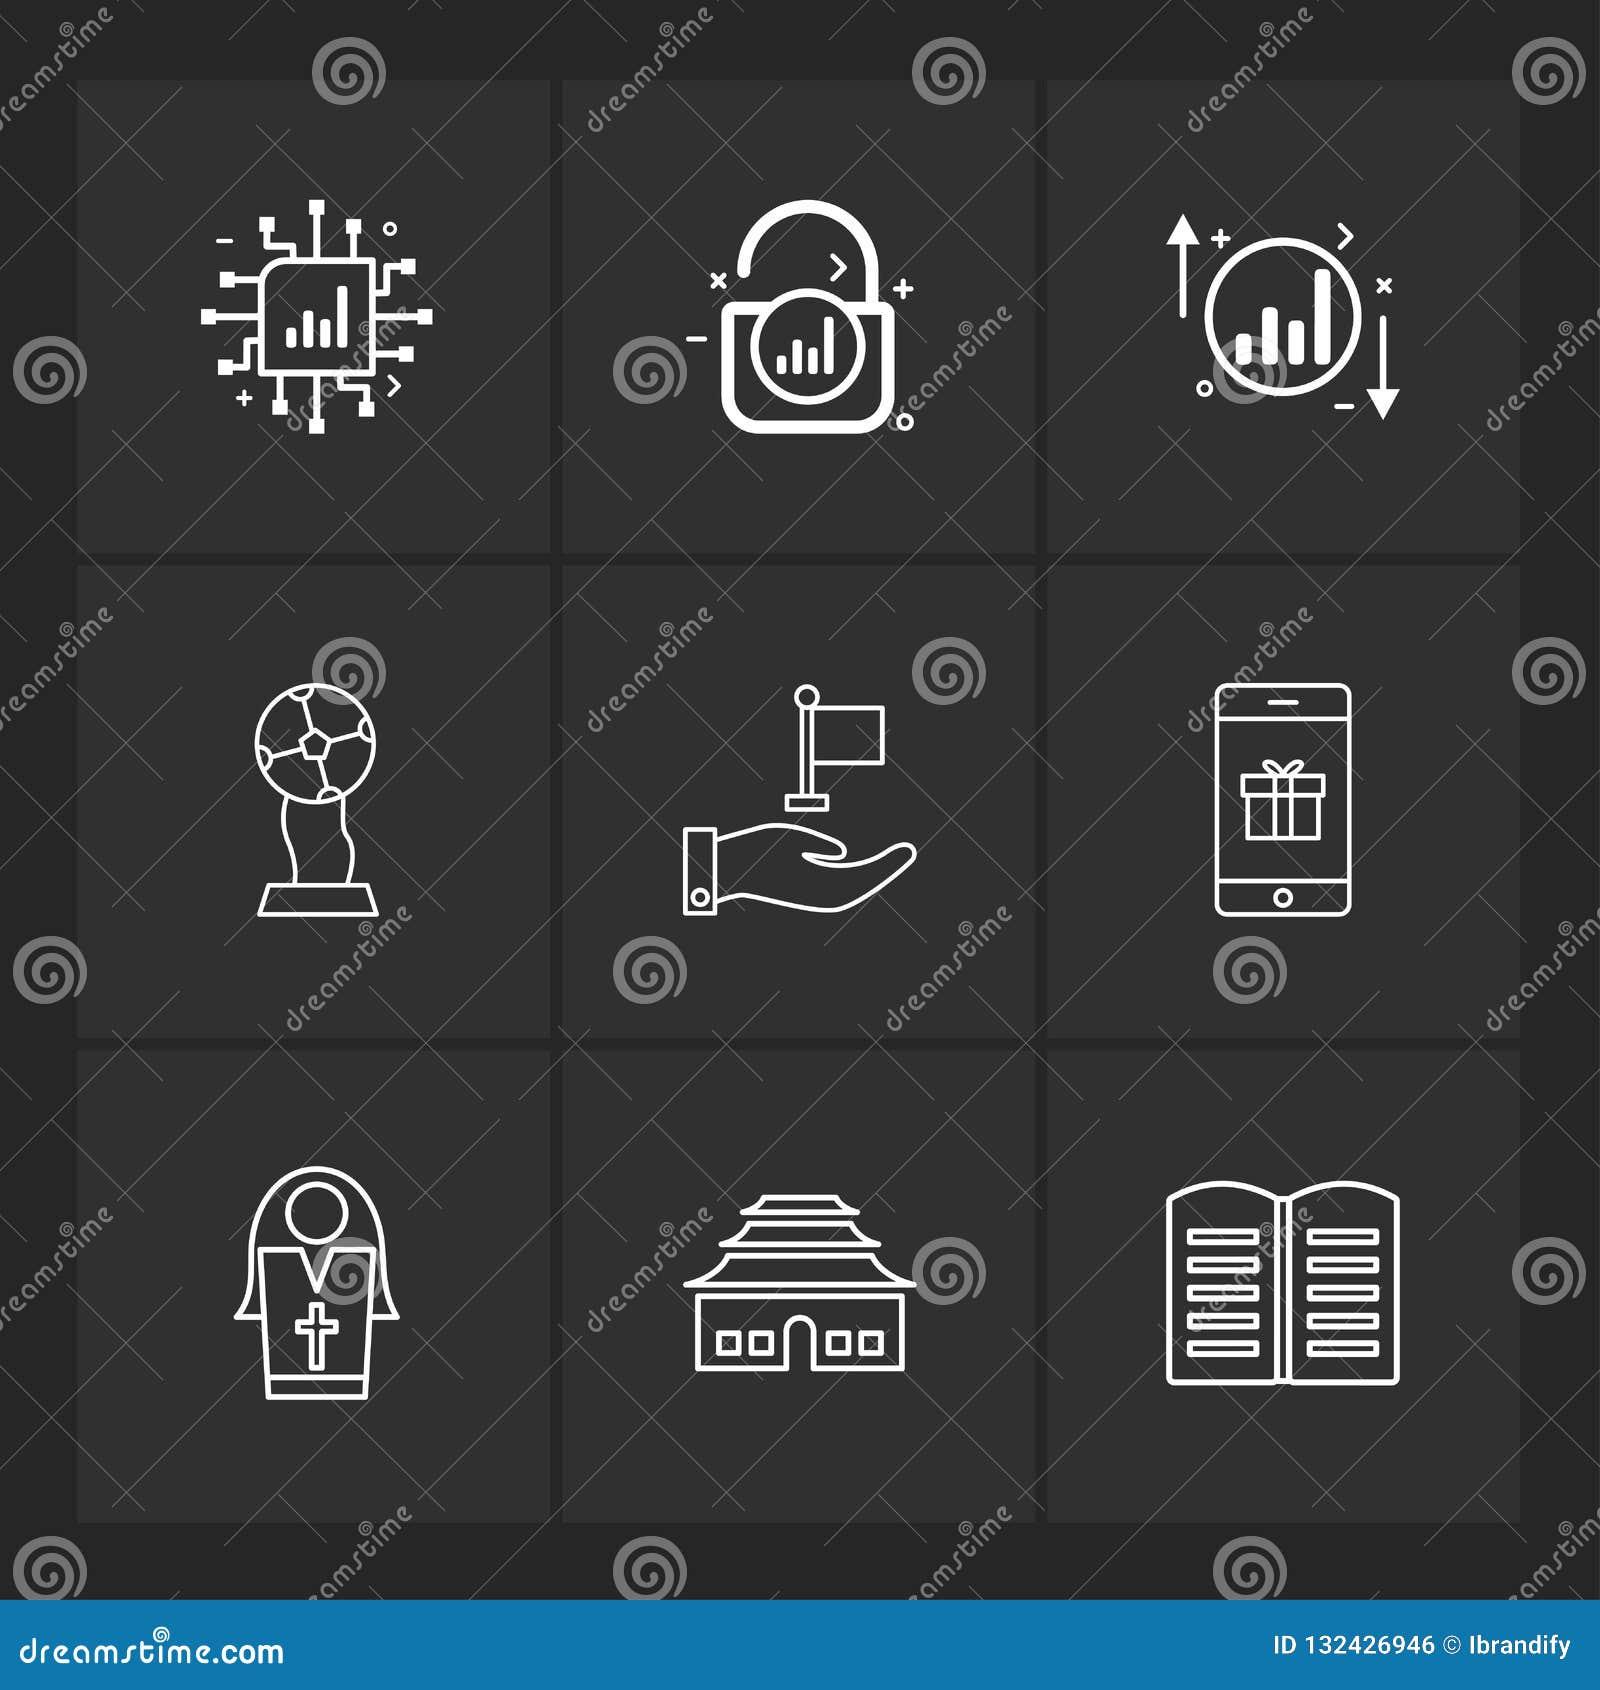 Ic , Lock , Unlock , Graph , Up , Down , Book , Smart Phone ,si